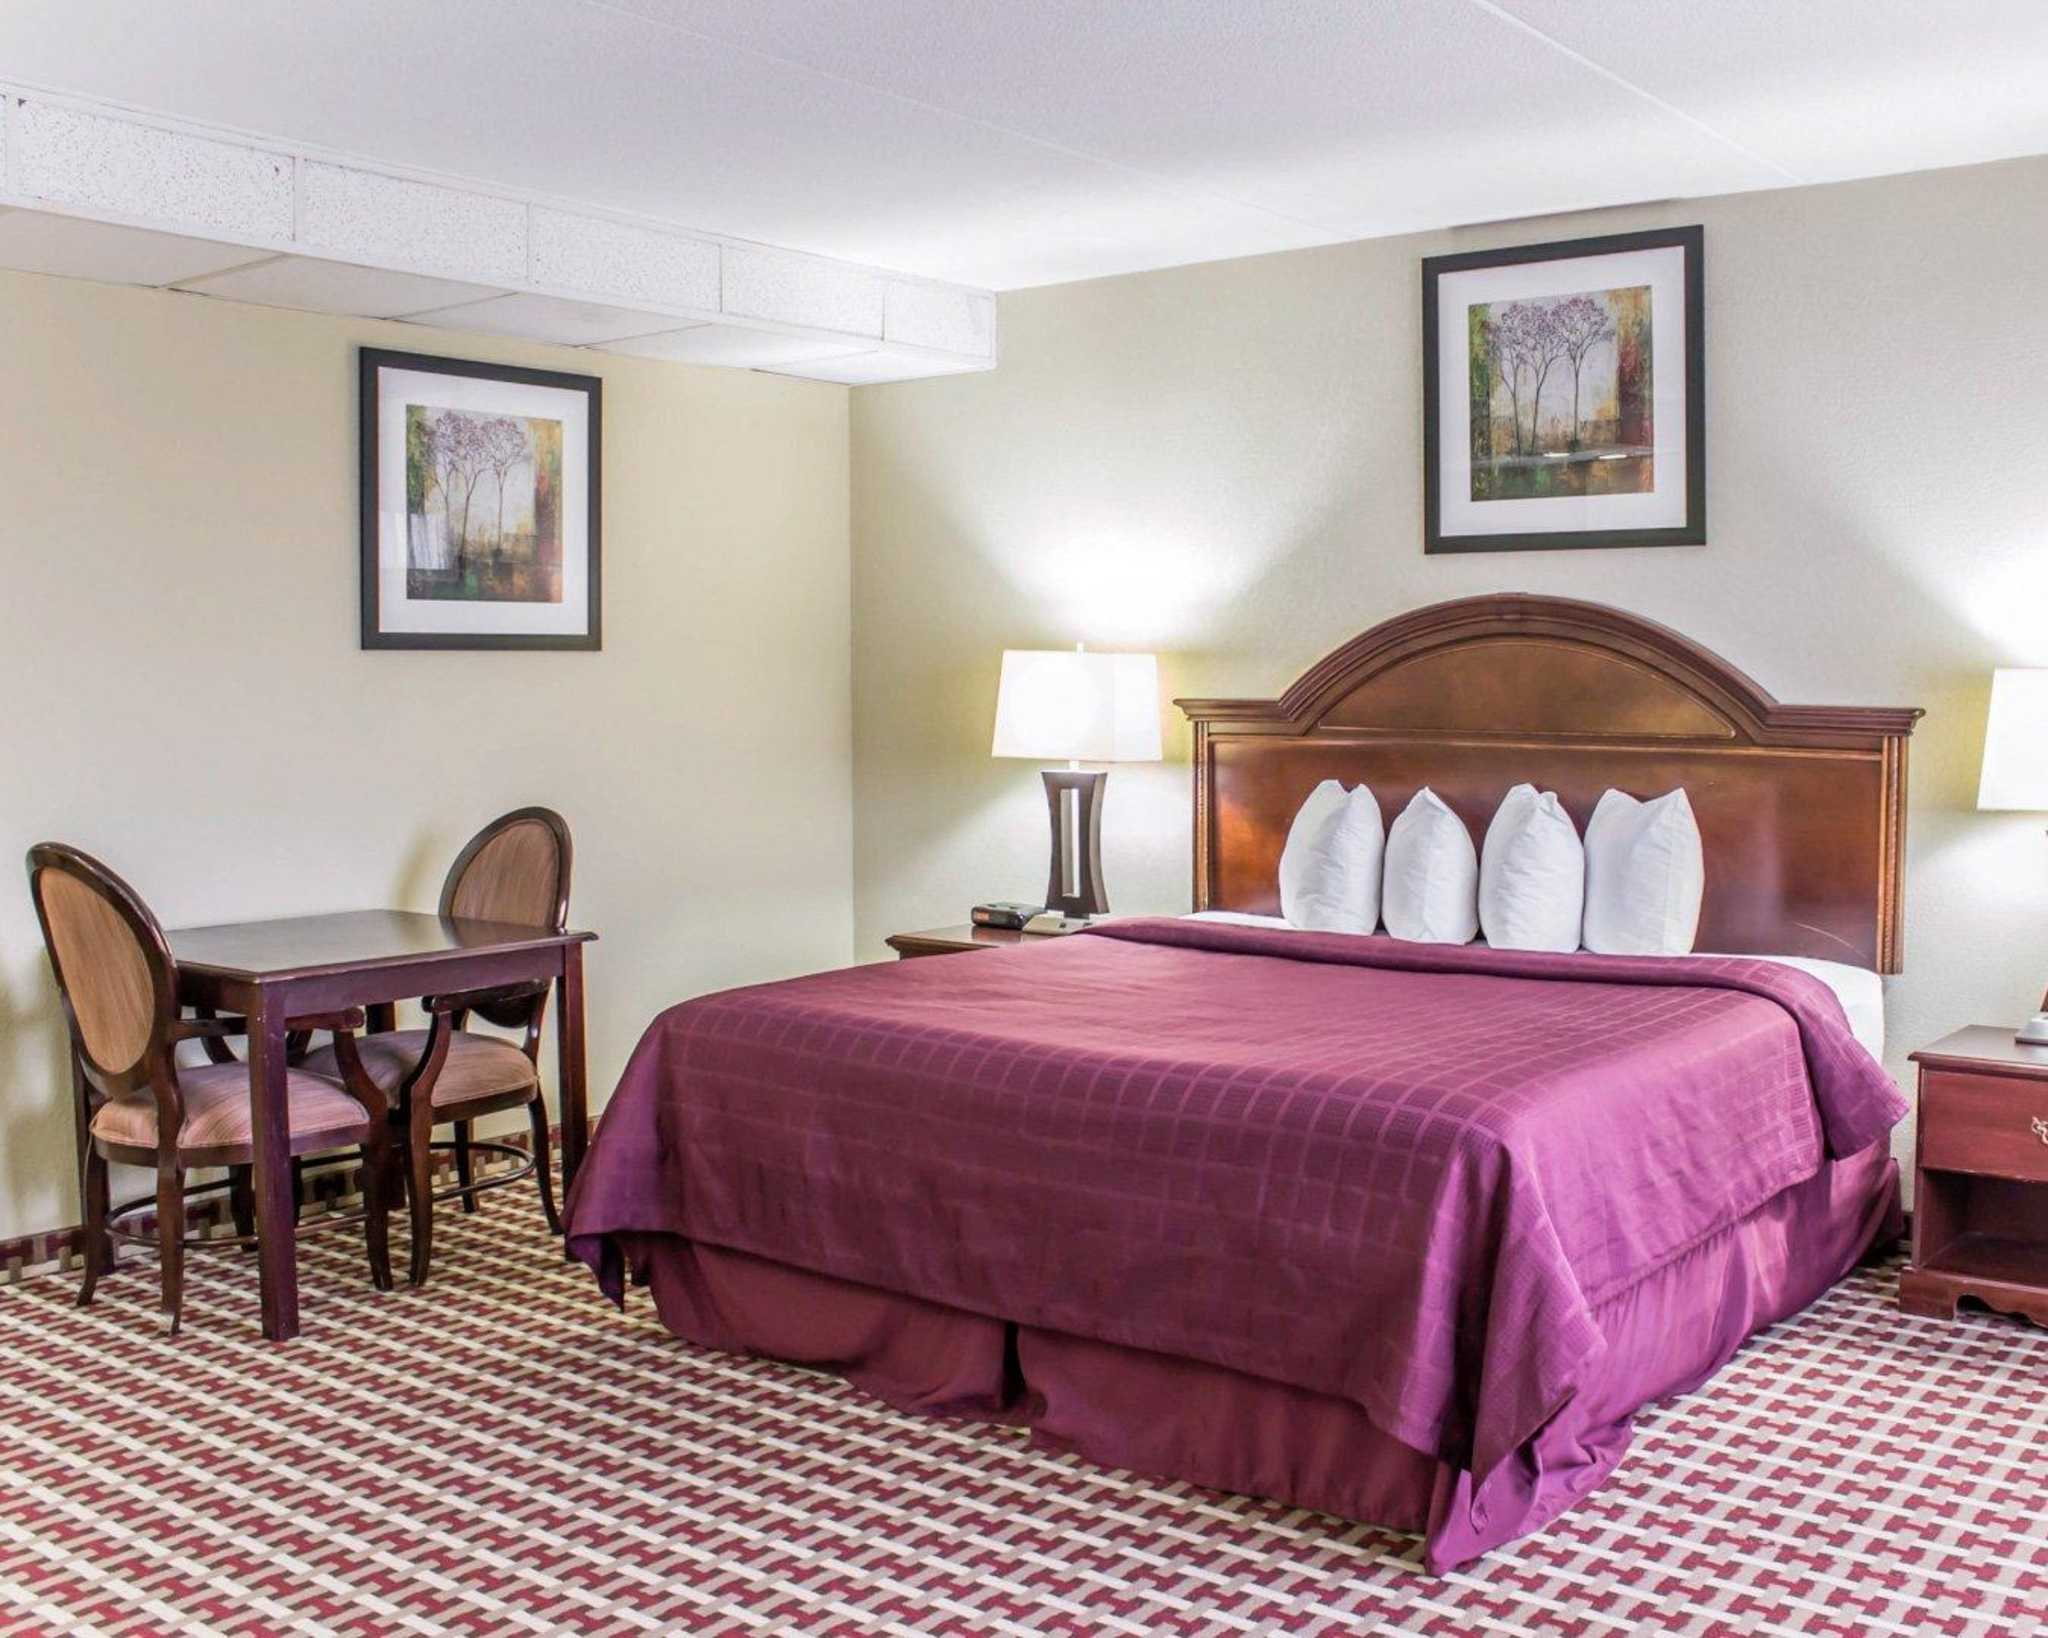 Quality Inn & Suites Fort Bragg image 7